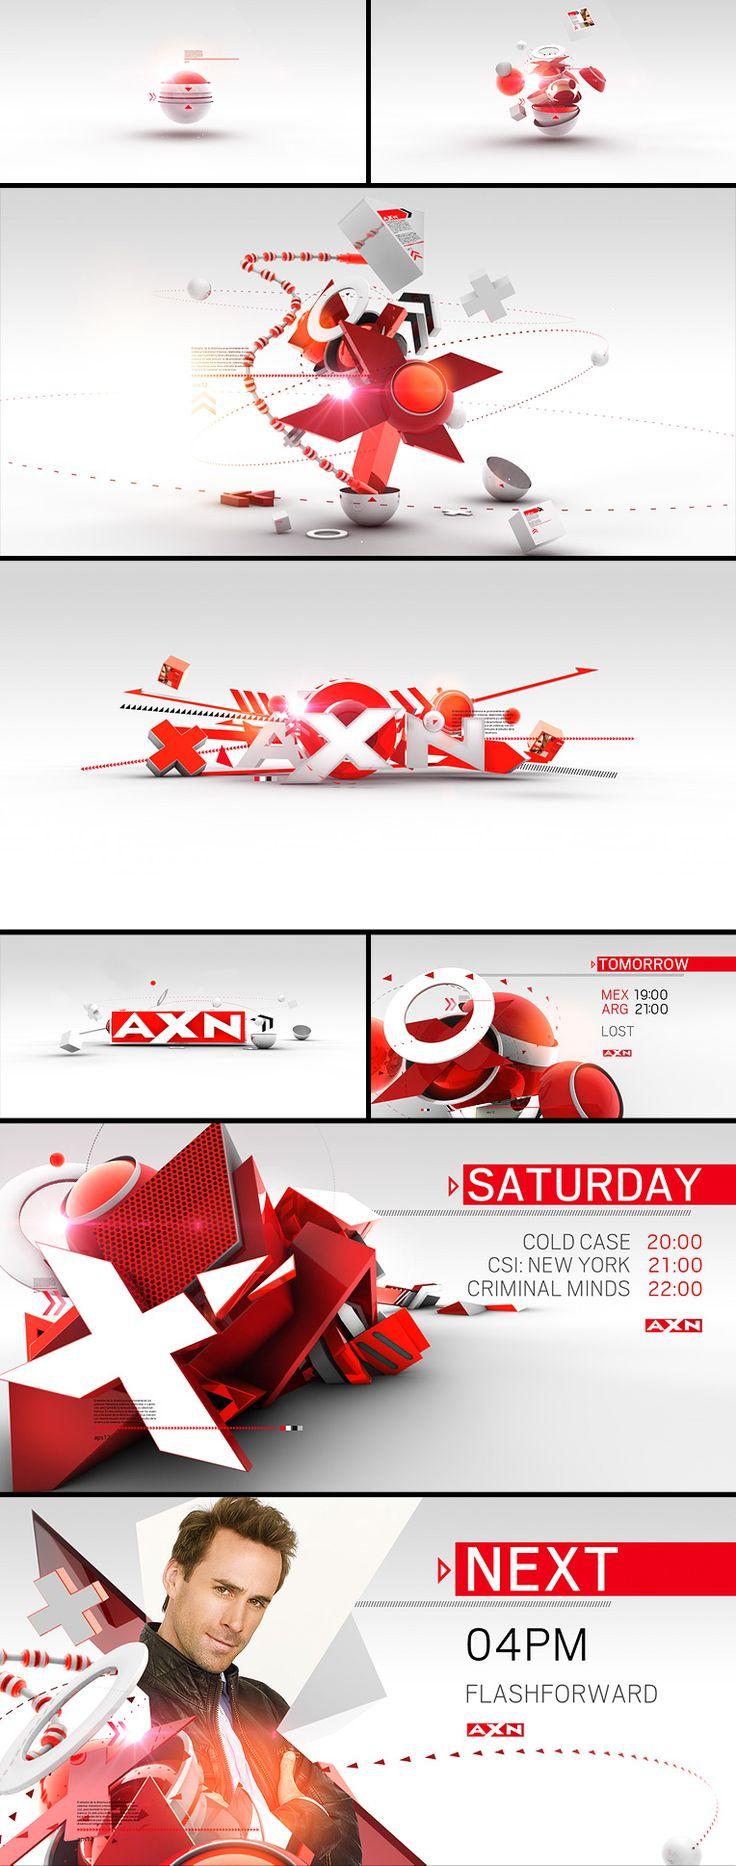 Loica.tv - Boards: Sony - AXN